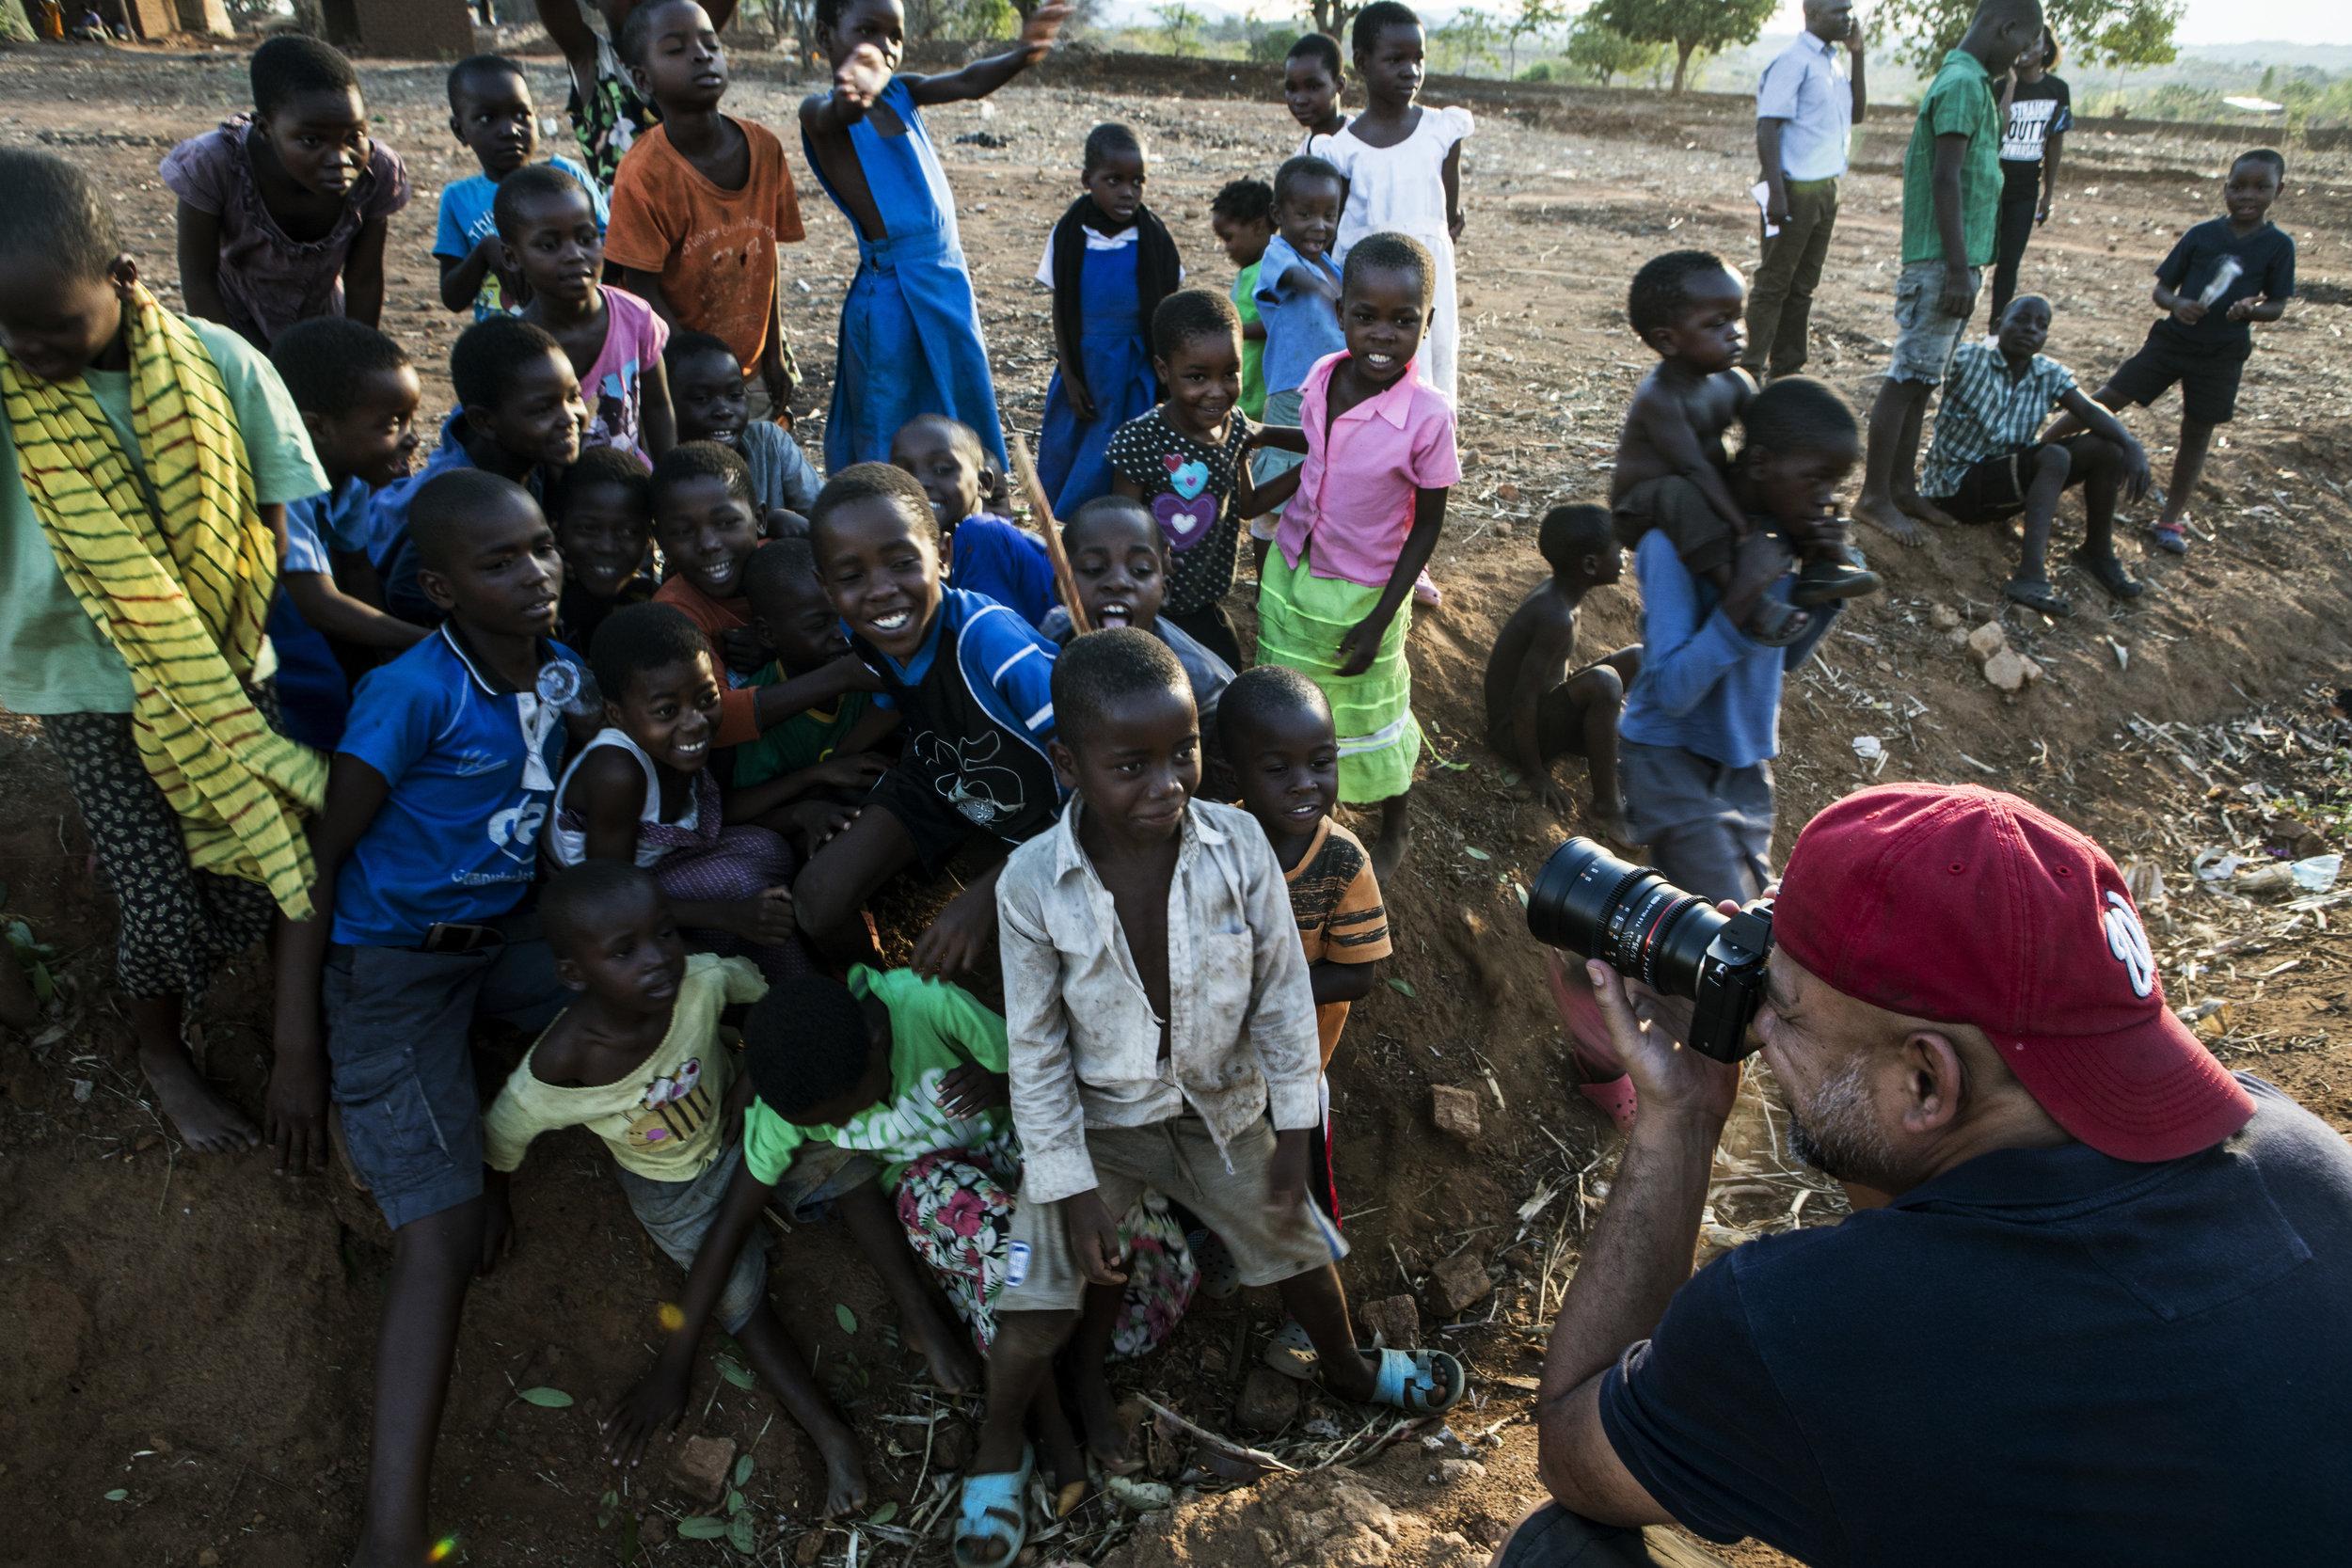 171114-Malawi-Grile-0307.jpg